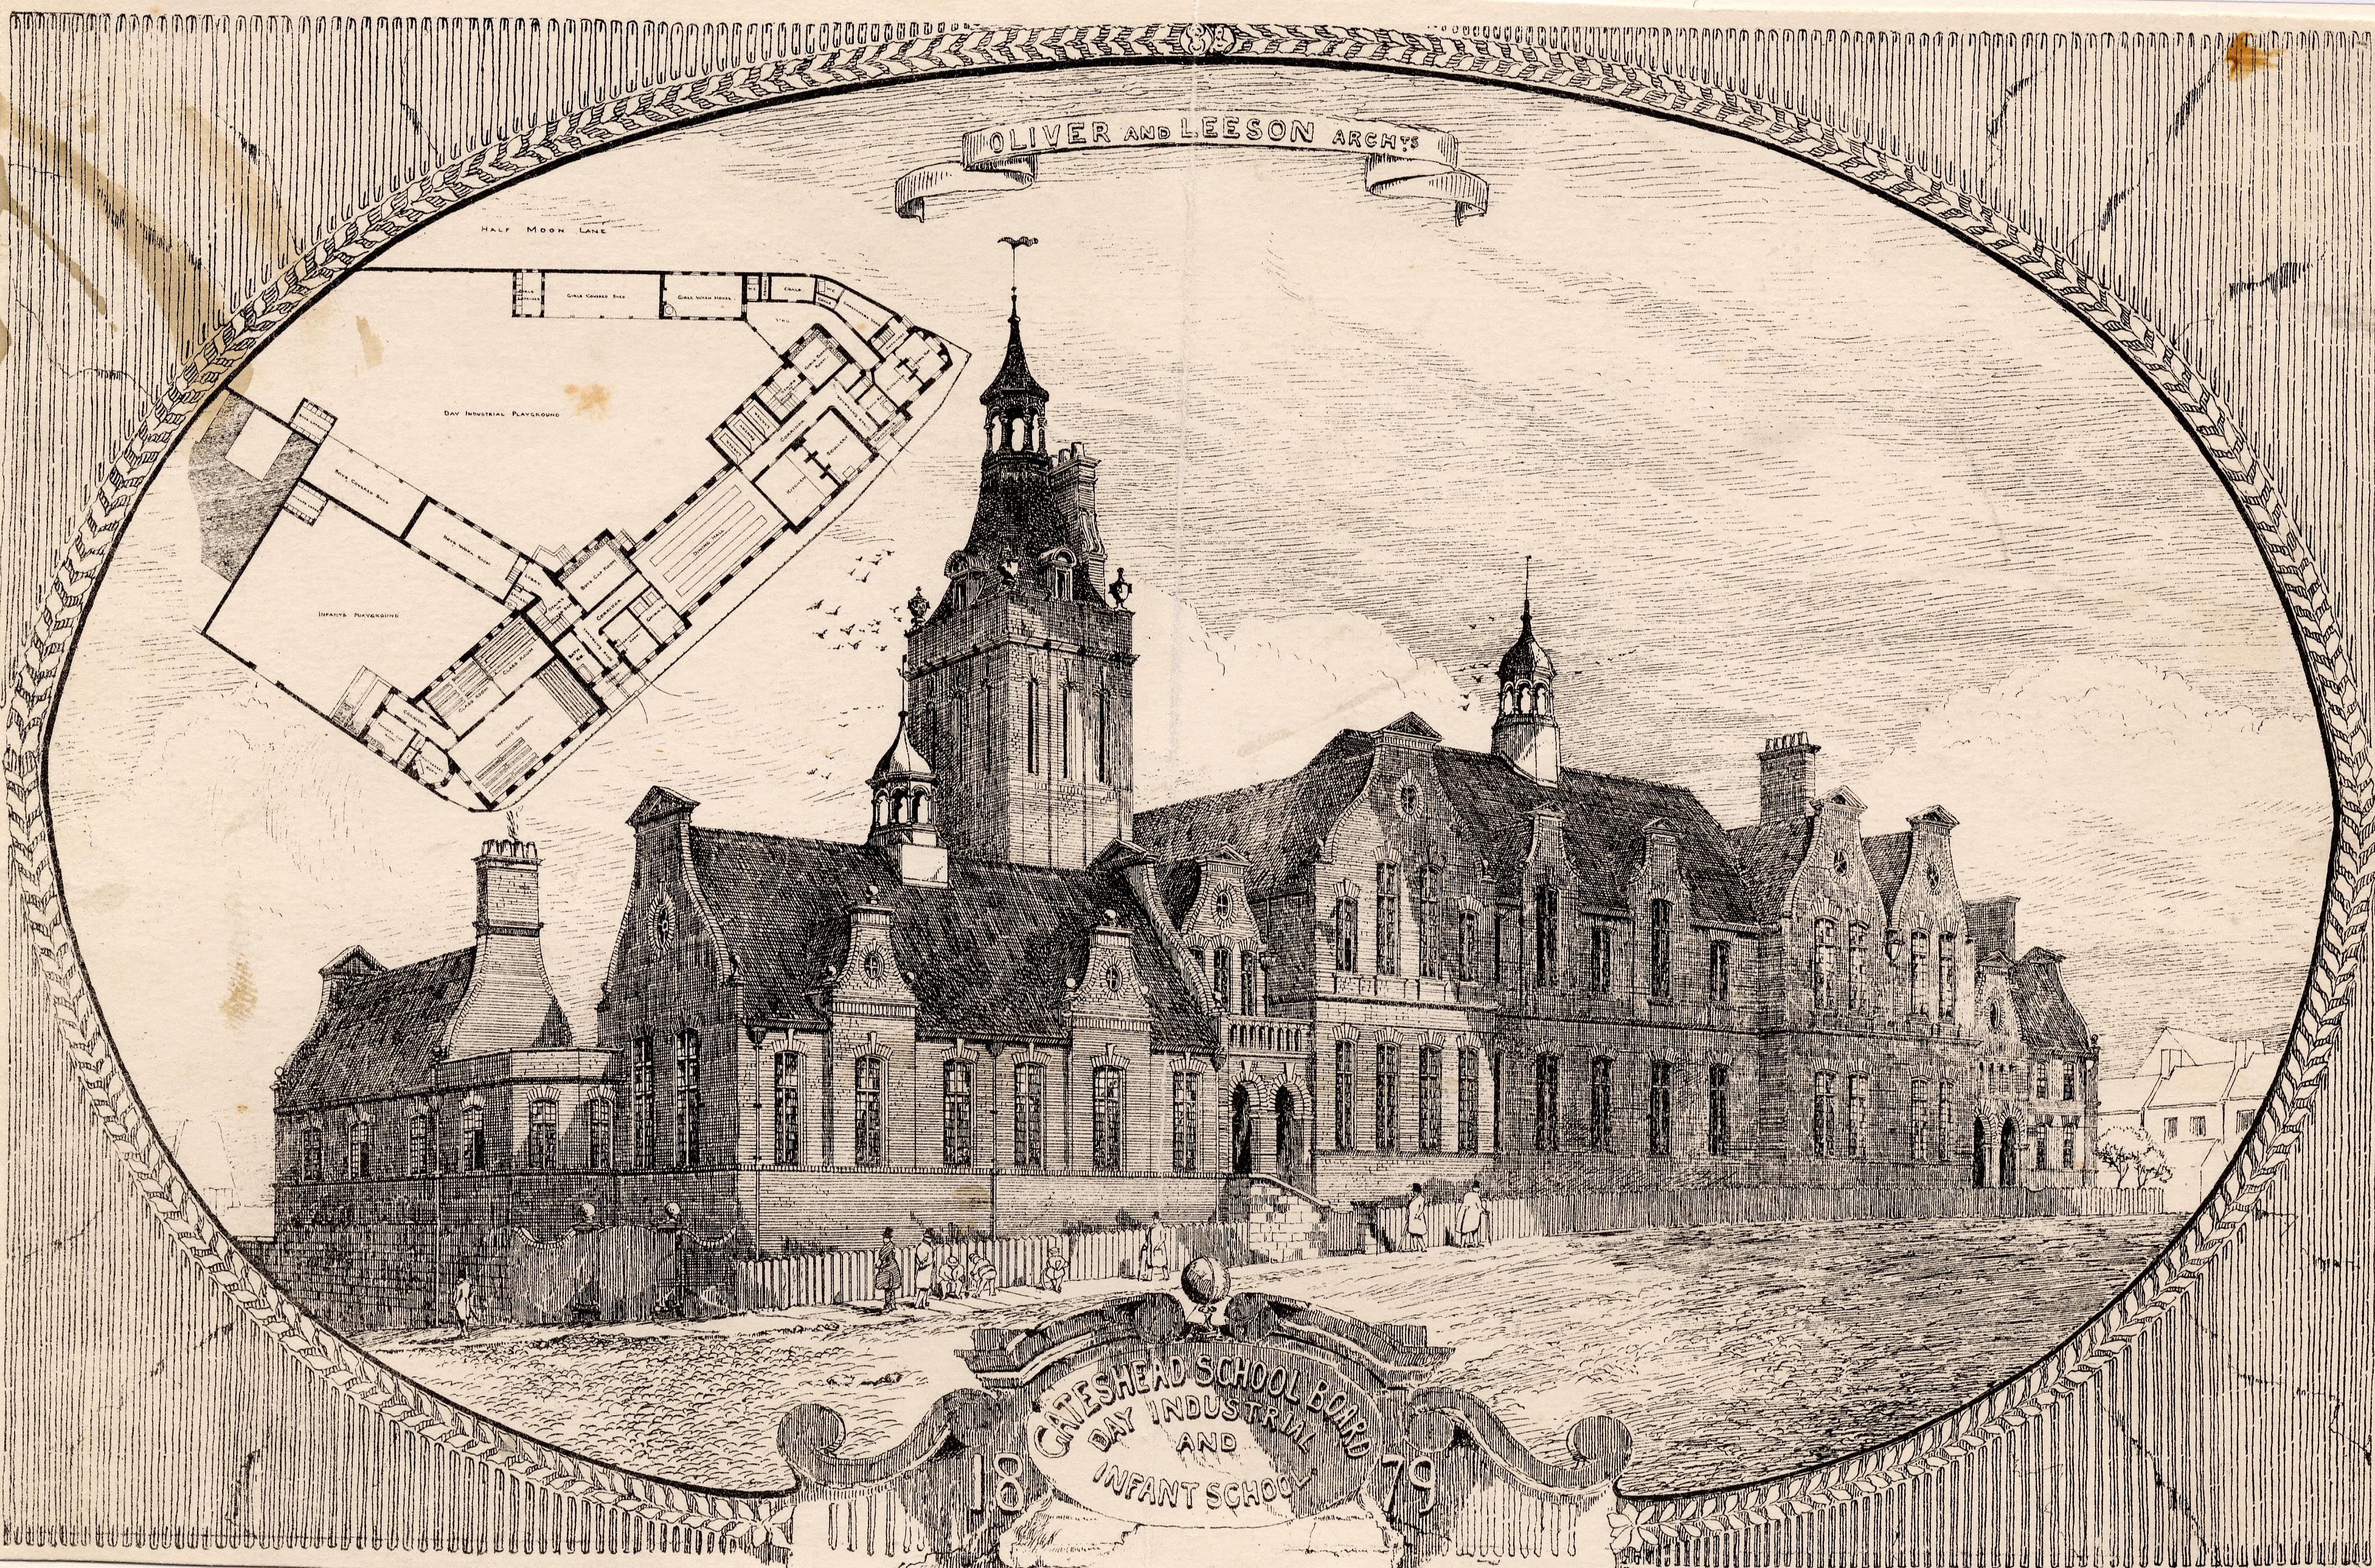 Windmill Hills Day Industrial School, Gateshead